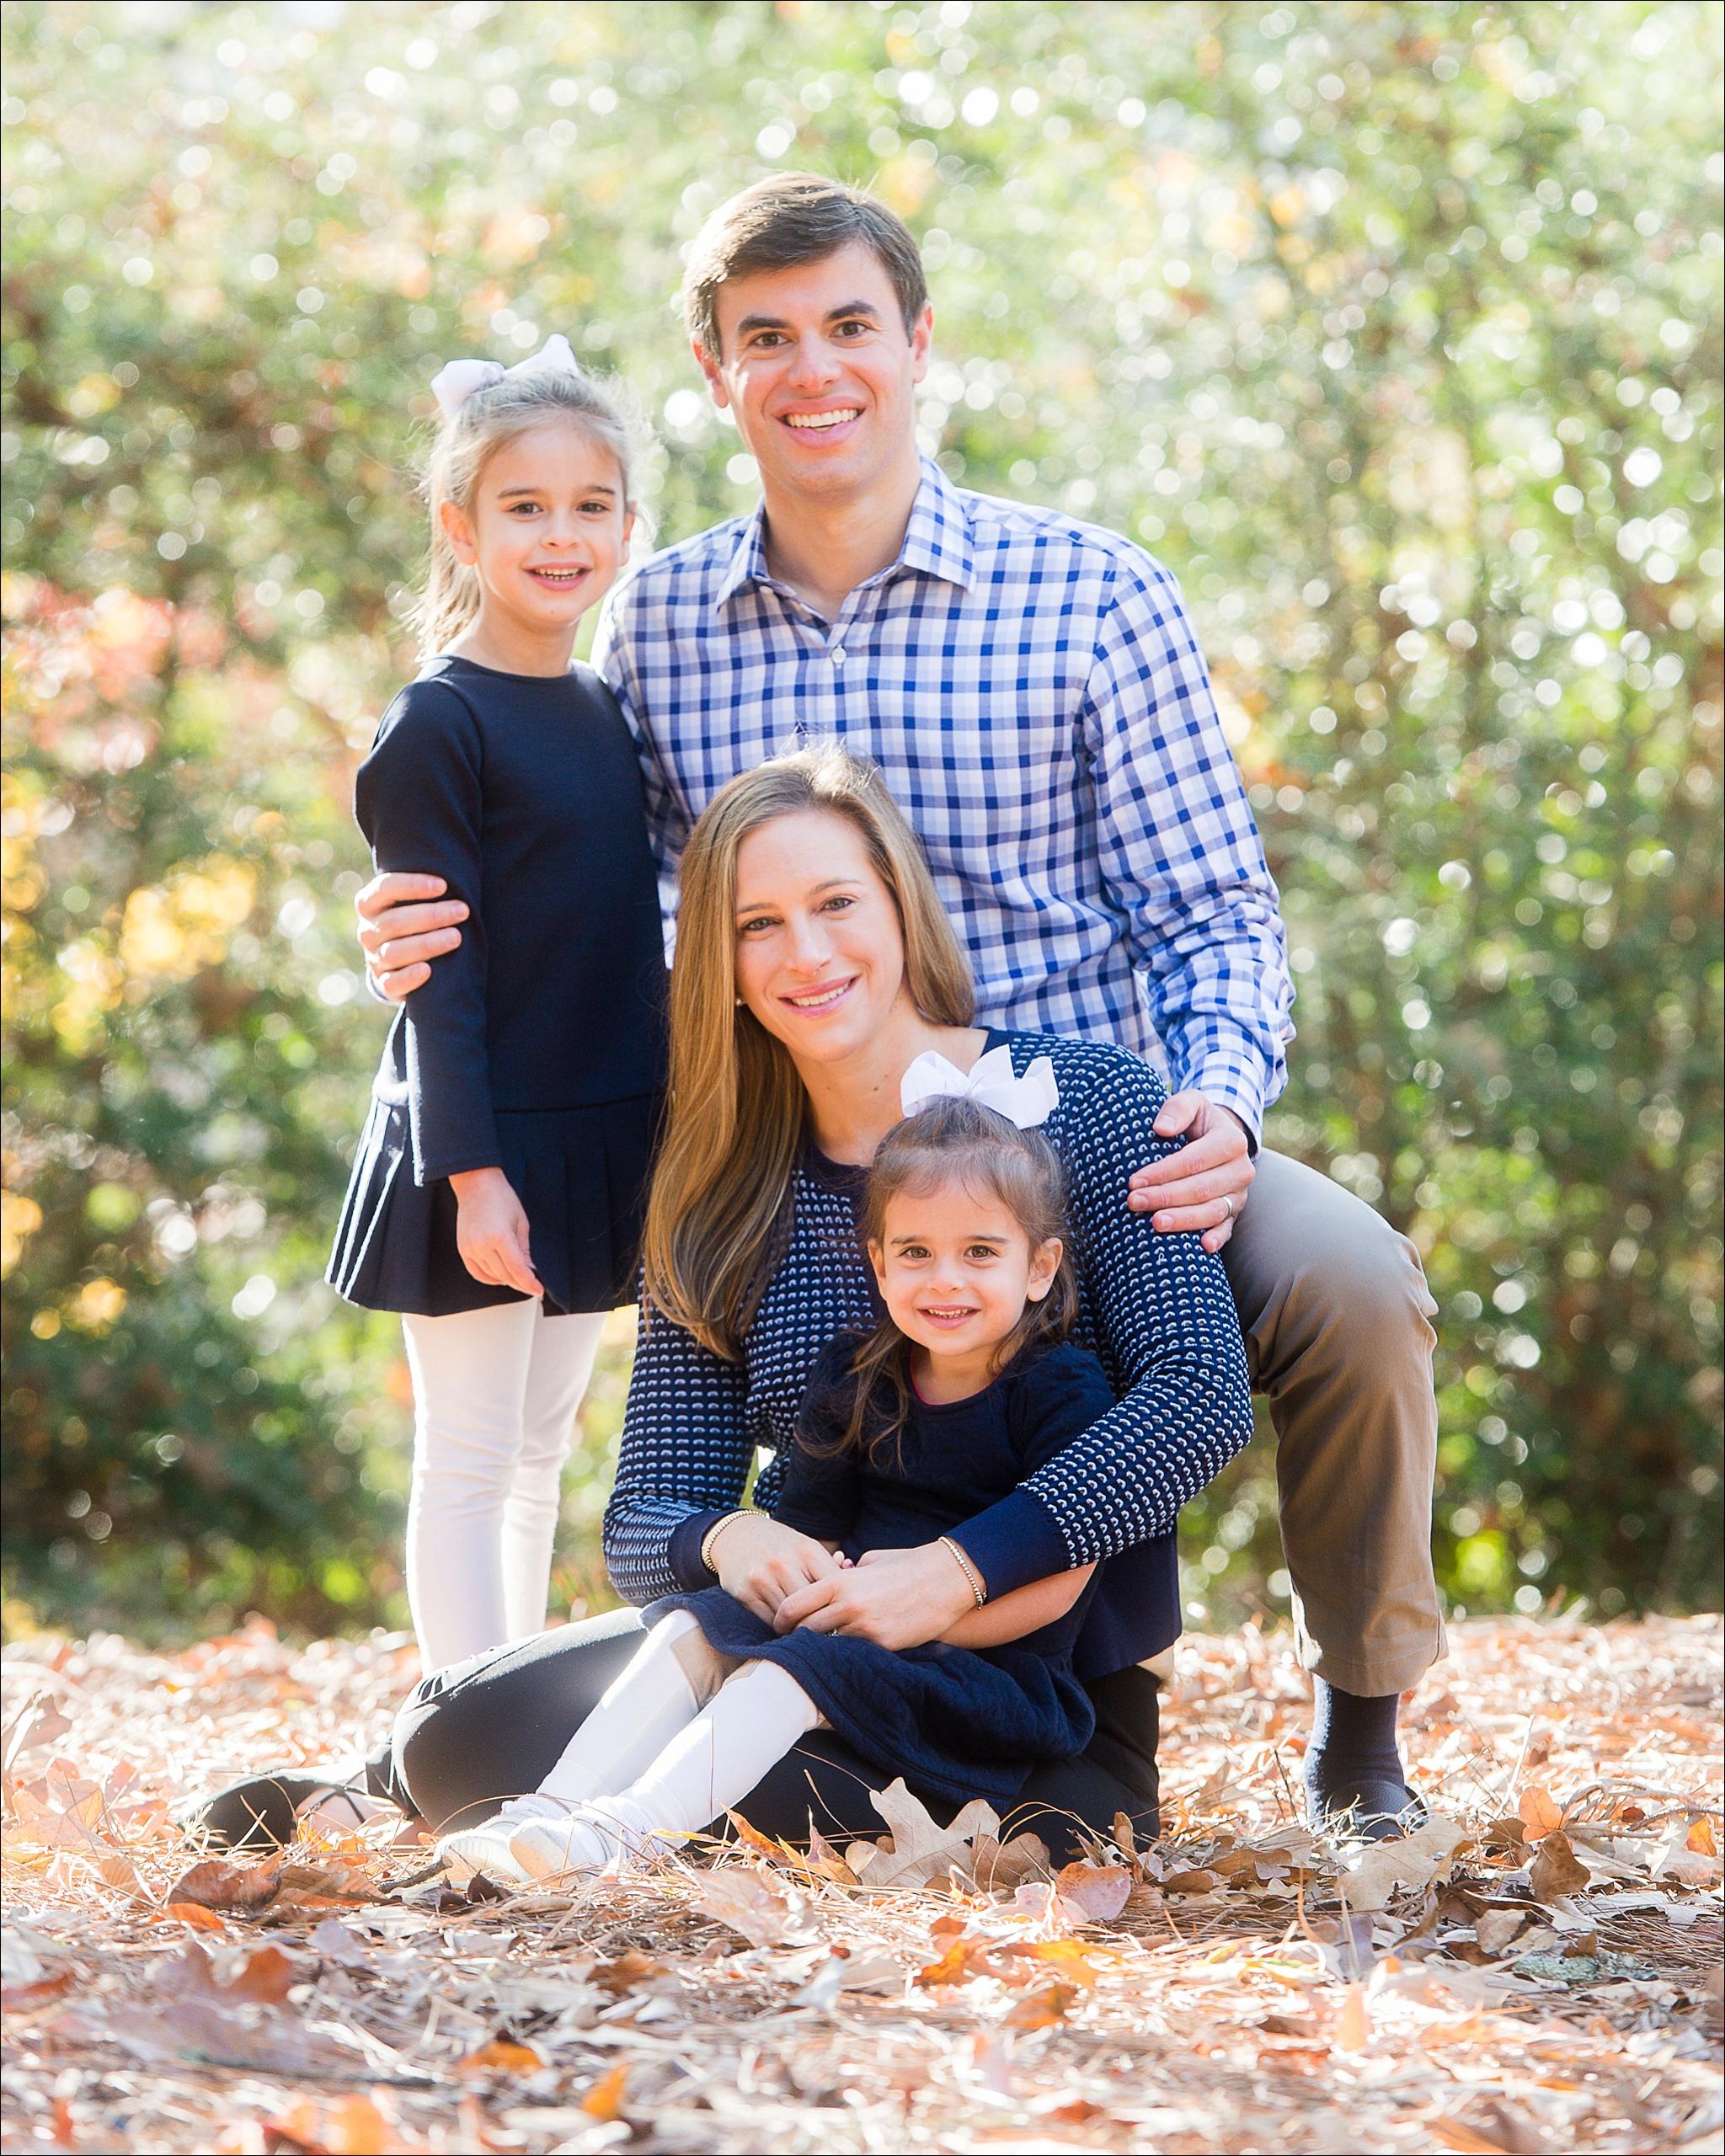 Mountain Brook Alabama Family Portrait Session